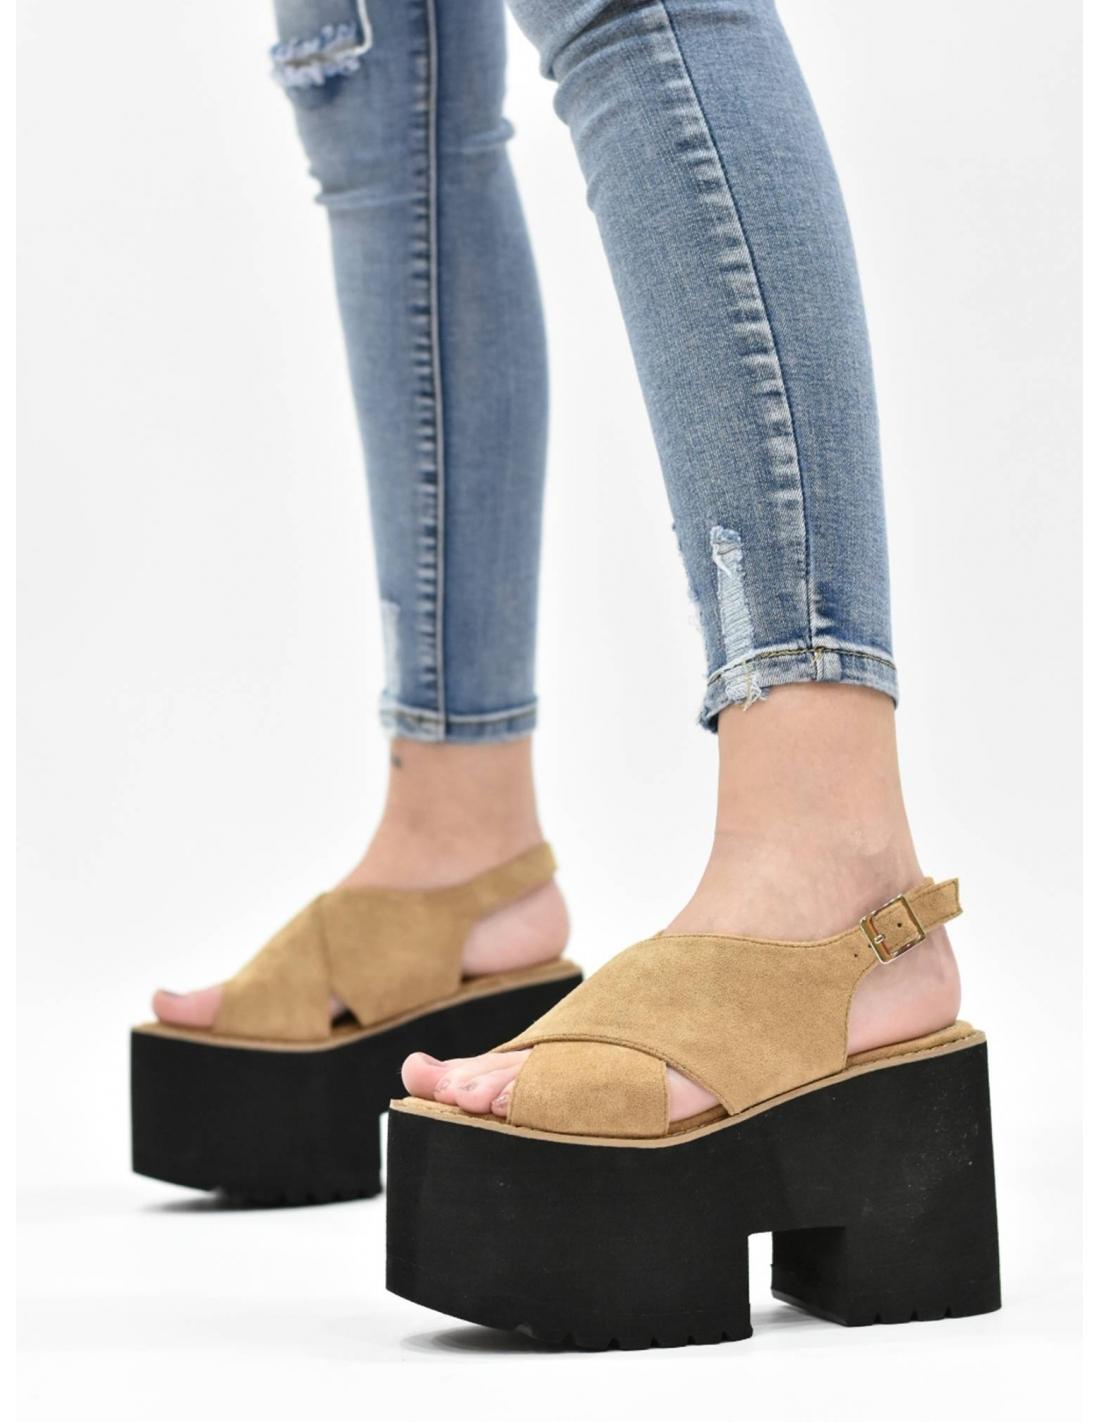 Sandalia cruzada de plataforma camel/...